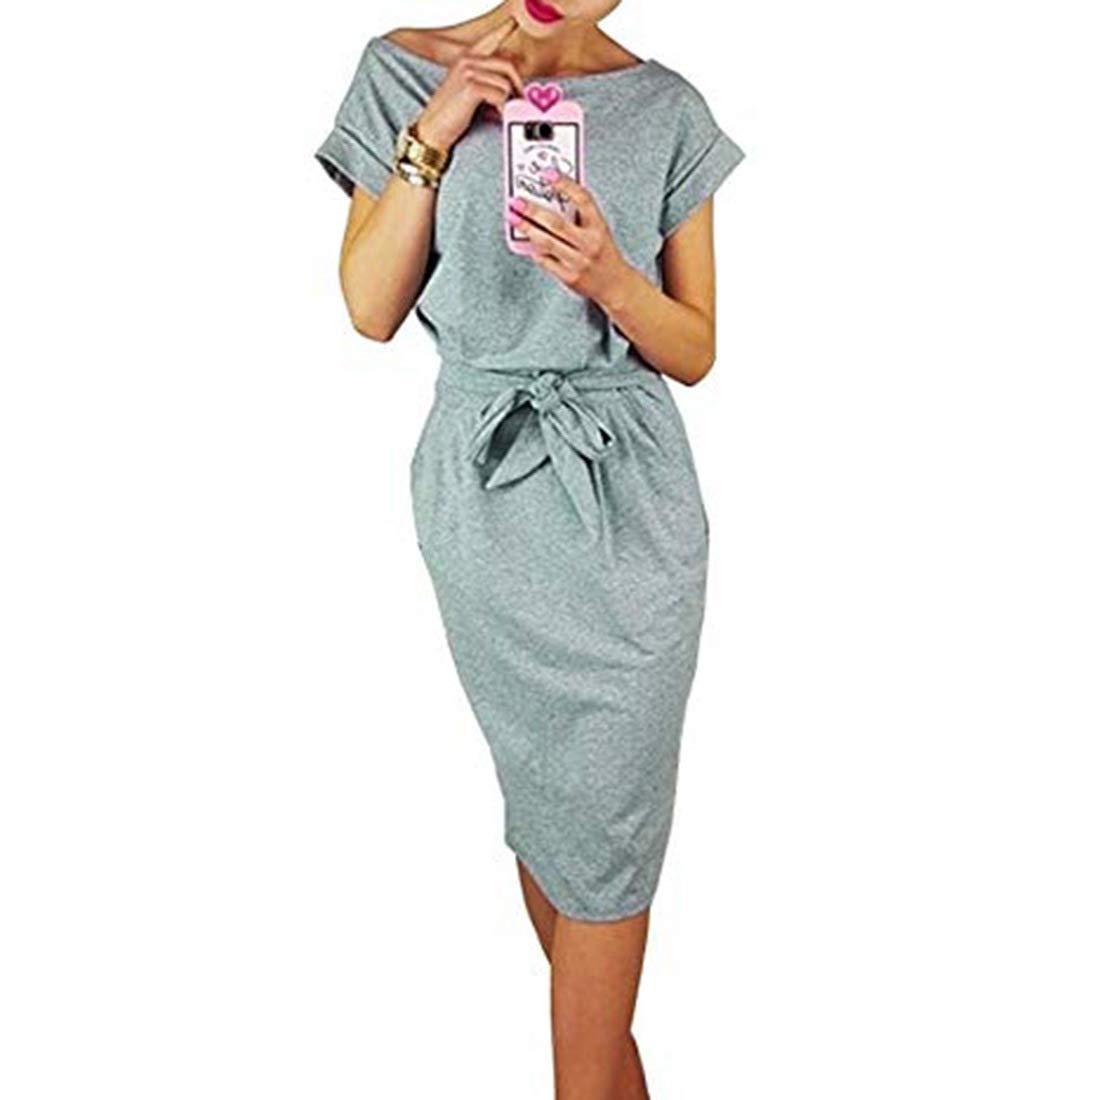 Shinekoo Autumn Women Elegant Long Sleeve Office Casual Pencil Dress with Pockets